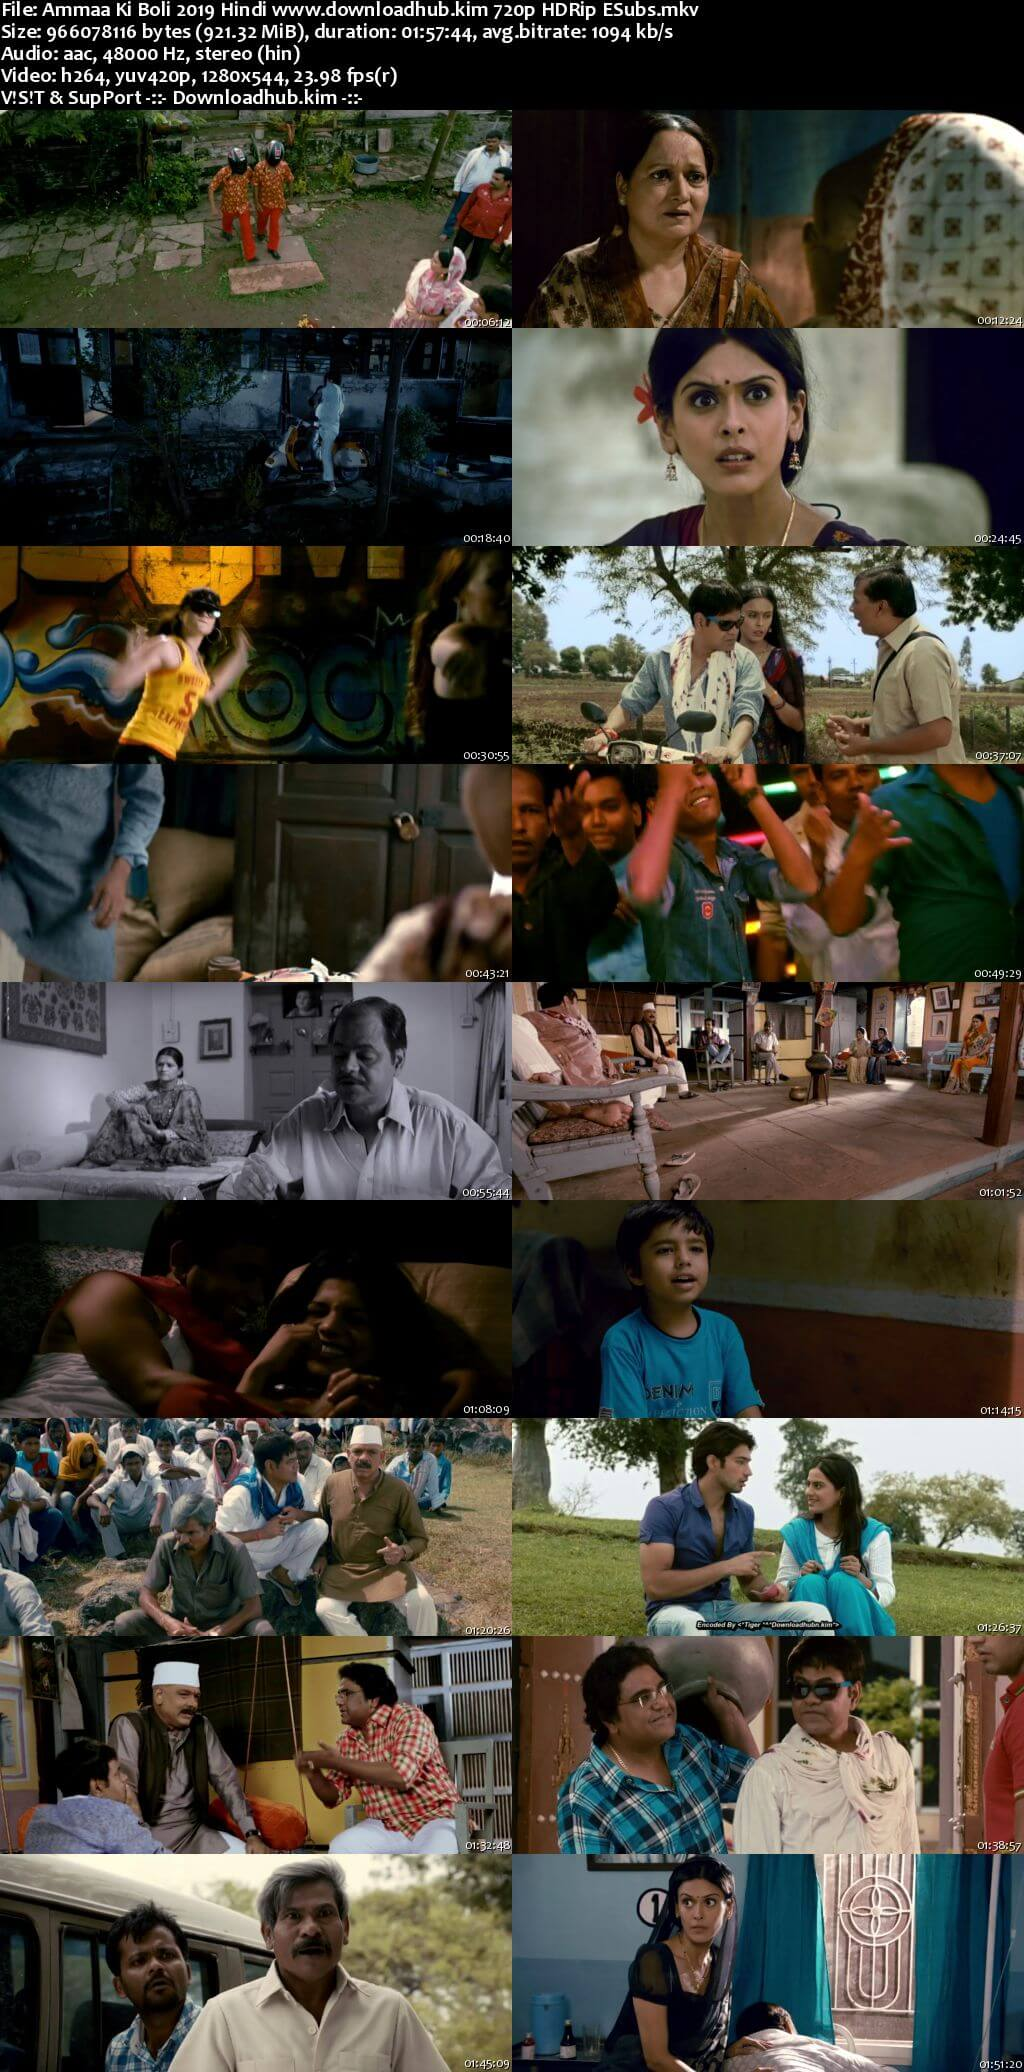 Ammaa Ki Boli 2019 Hindi 720p HDRip ESubs